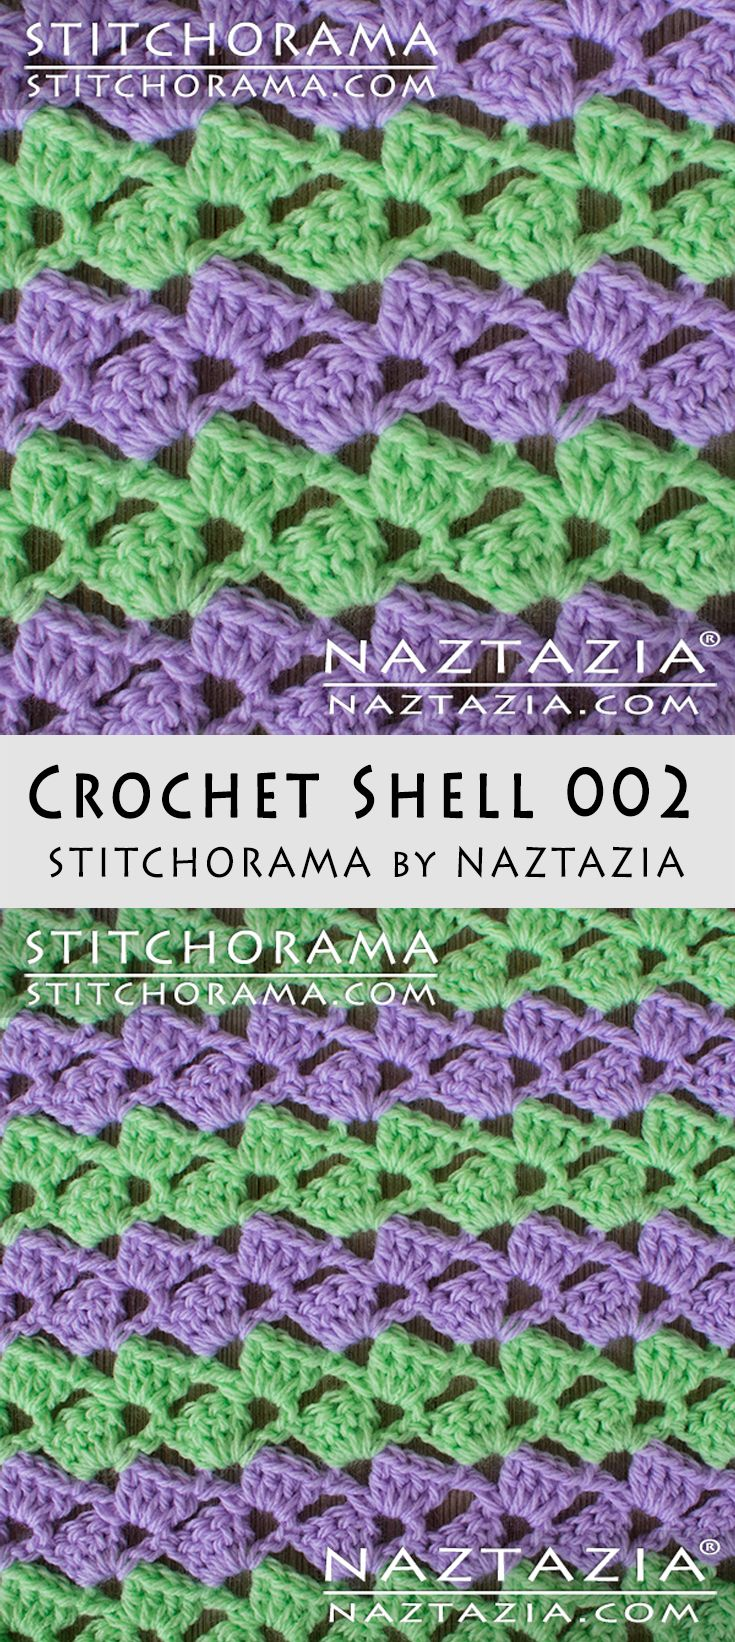 Crochet Shell 002 - Stitchorama by Naztazia | Afghan Crochet ...